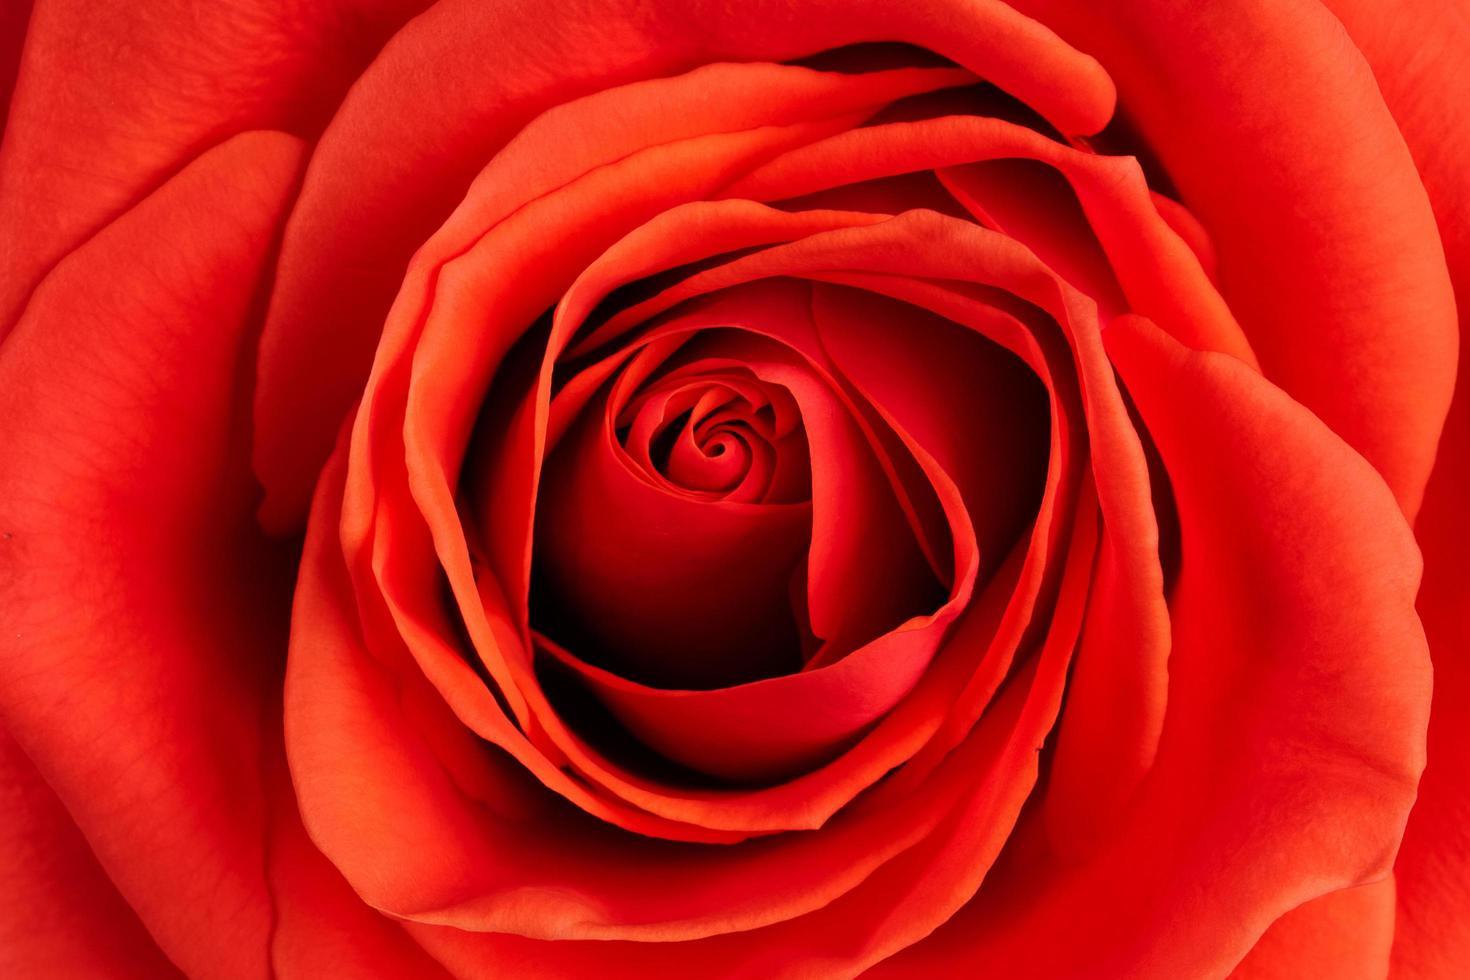 fondo de rosa escarlata fresca foto